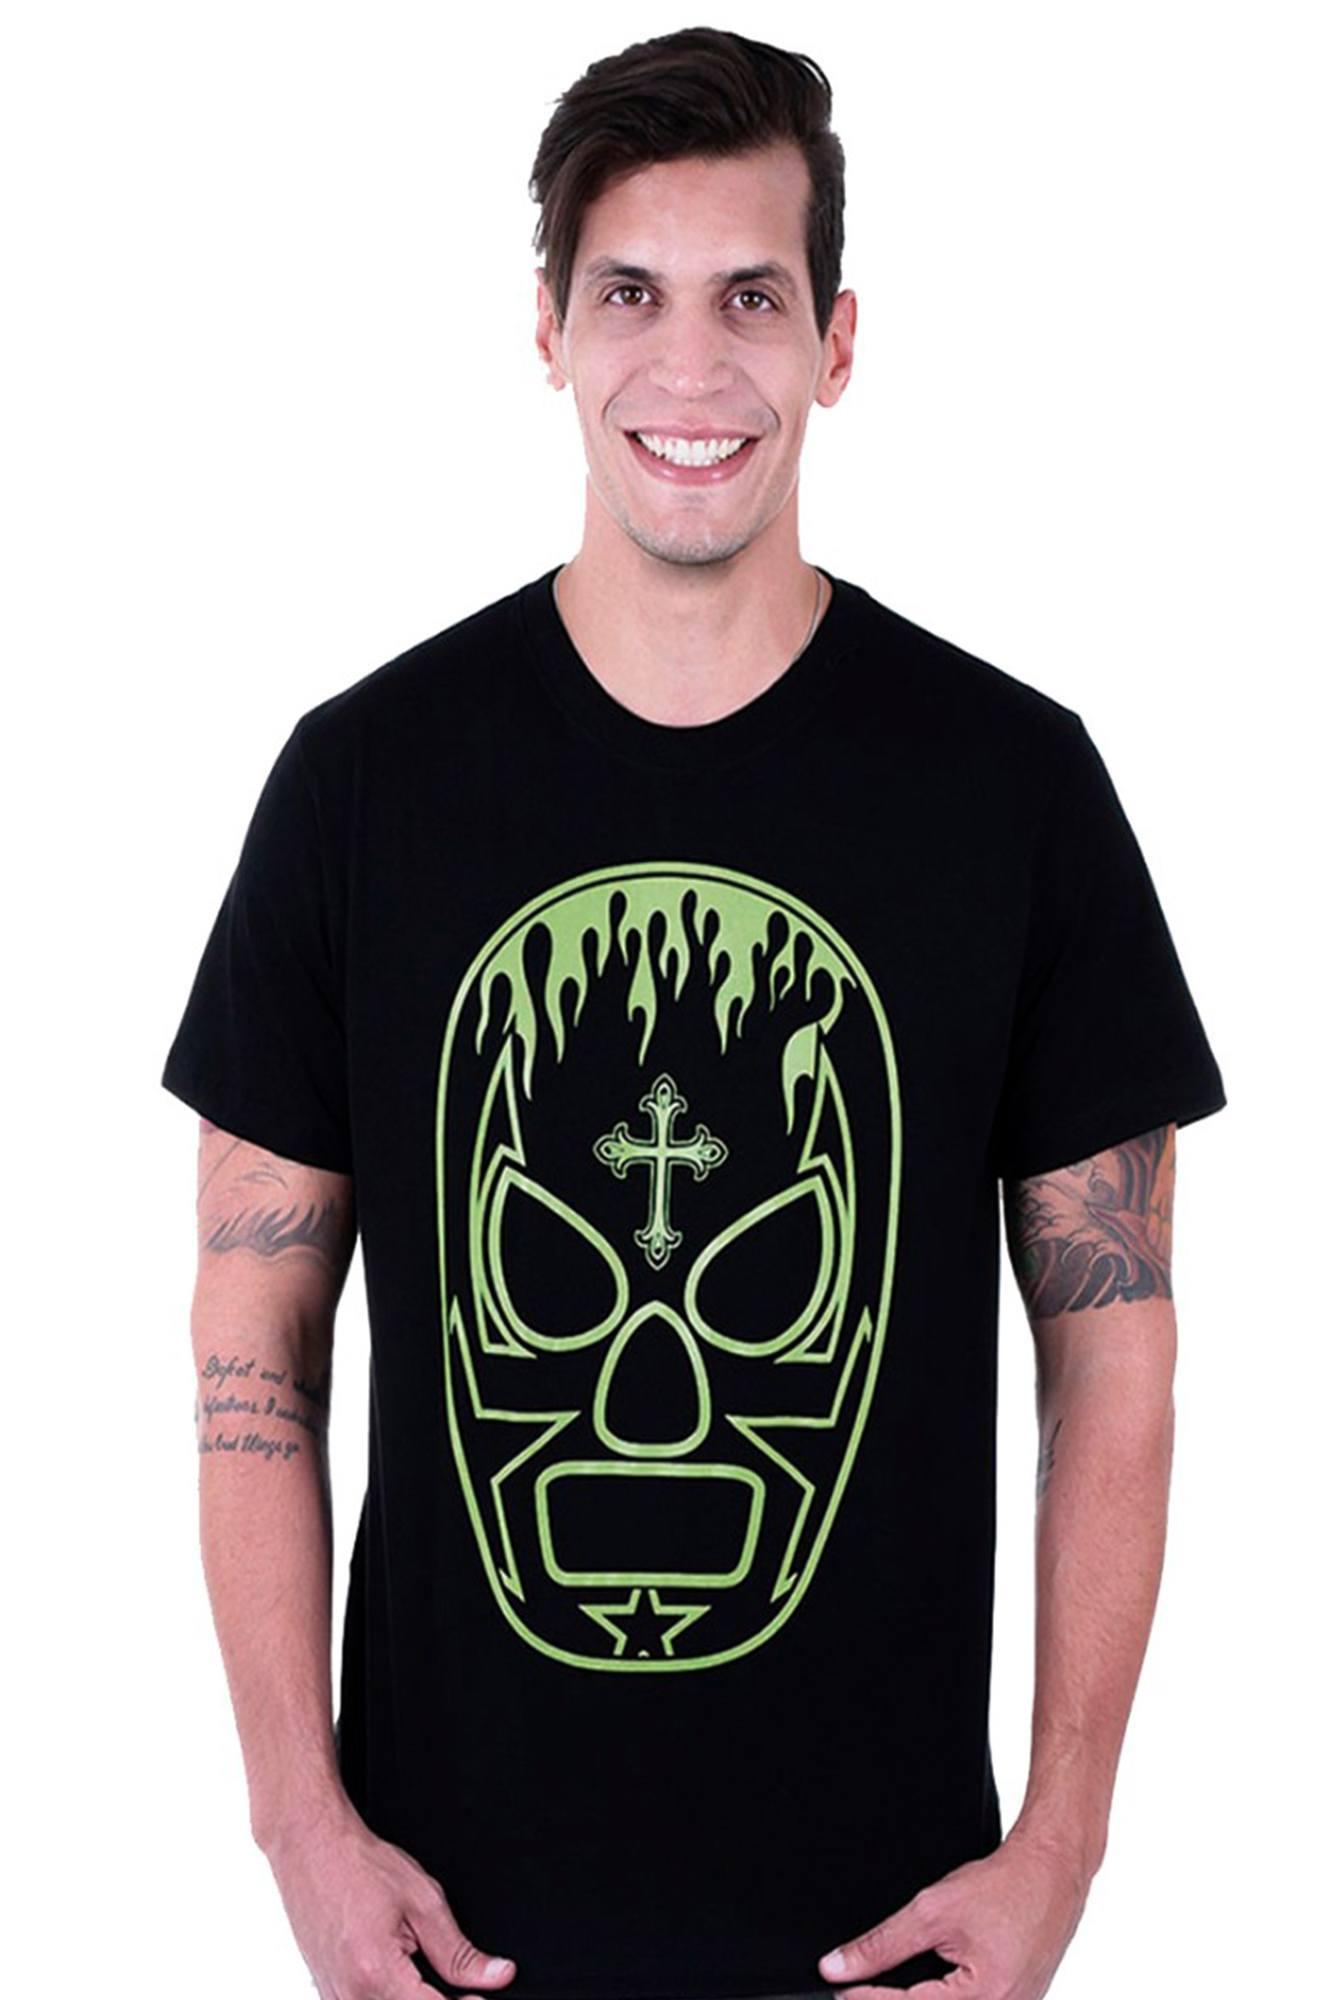 Camiseta masculina preta Lucha Libre - 100% algodão - Hardivision